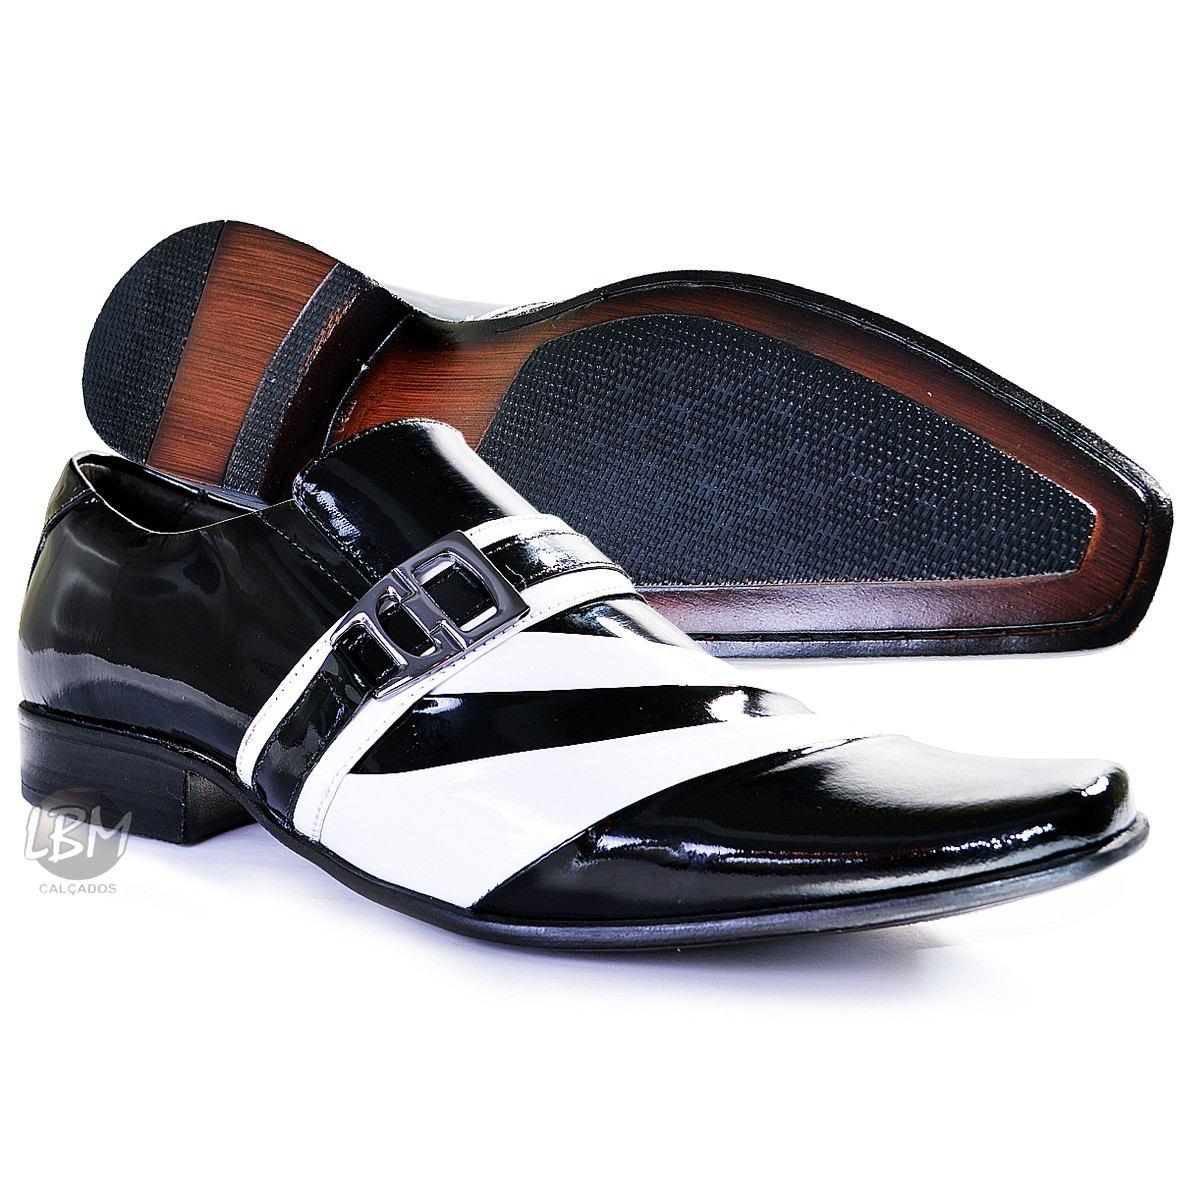 c7138e579e sapato social masculino couro envernizado. Carregando zoom.